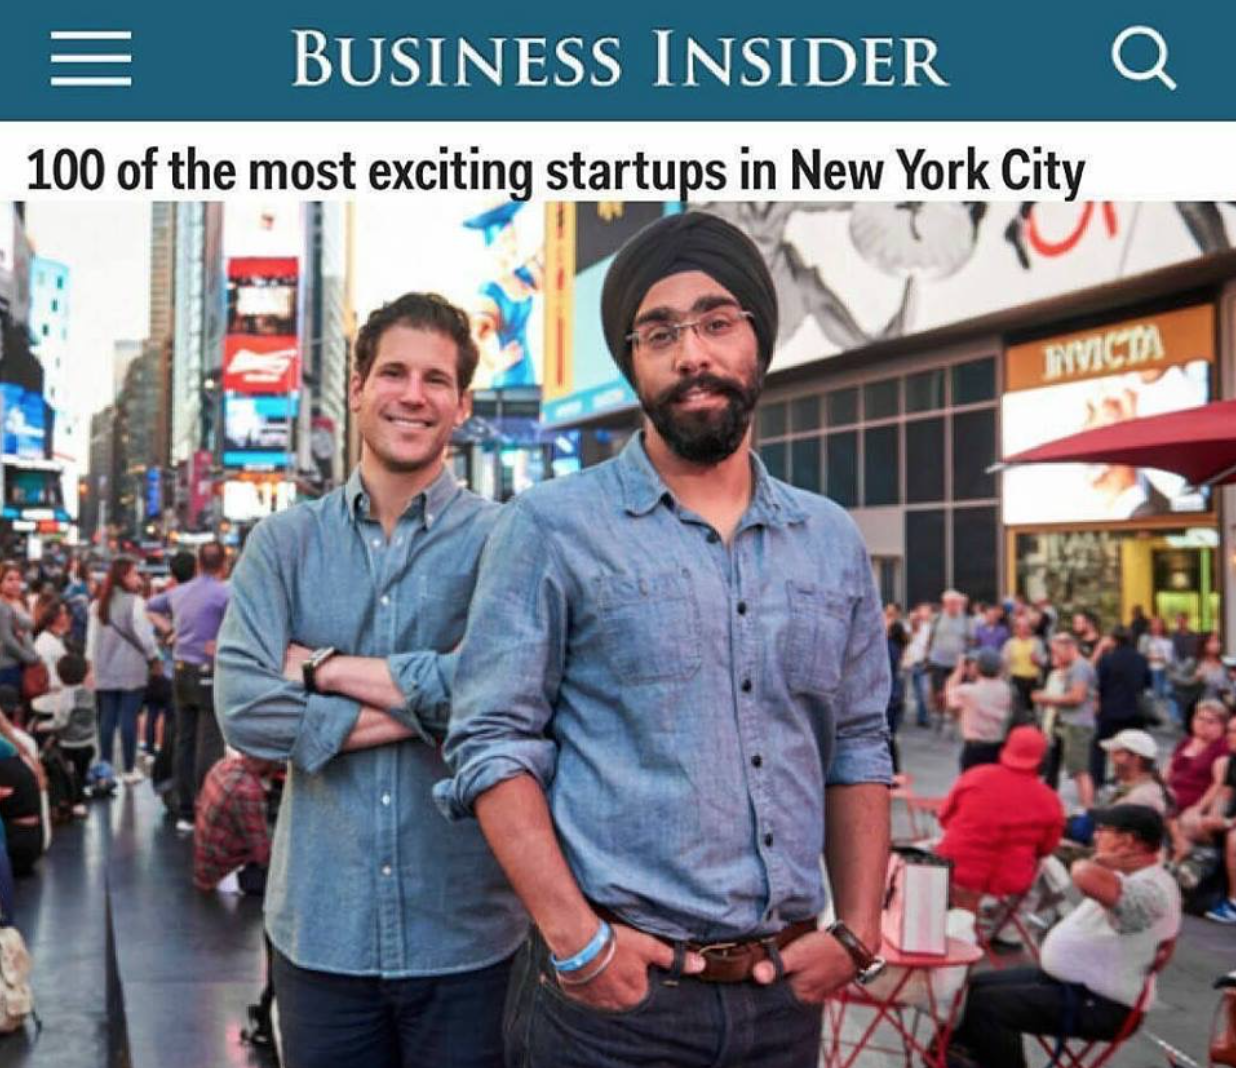 Business Insider (12/2016)